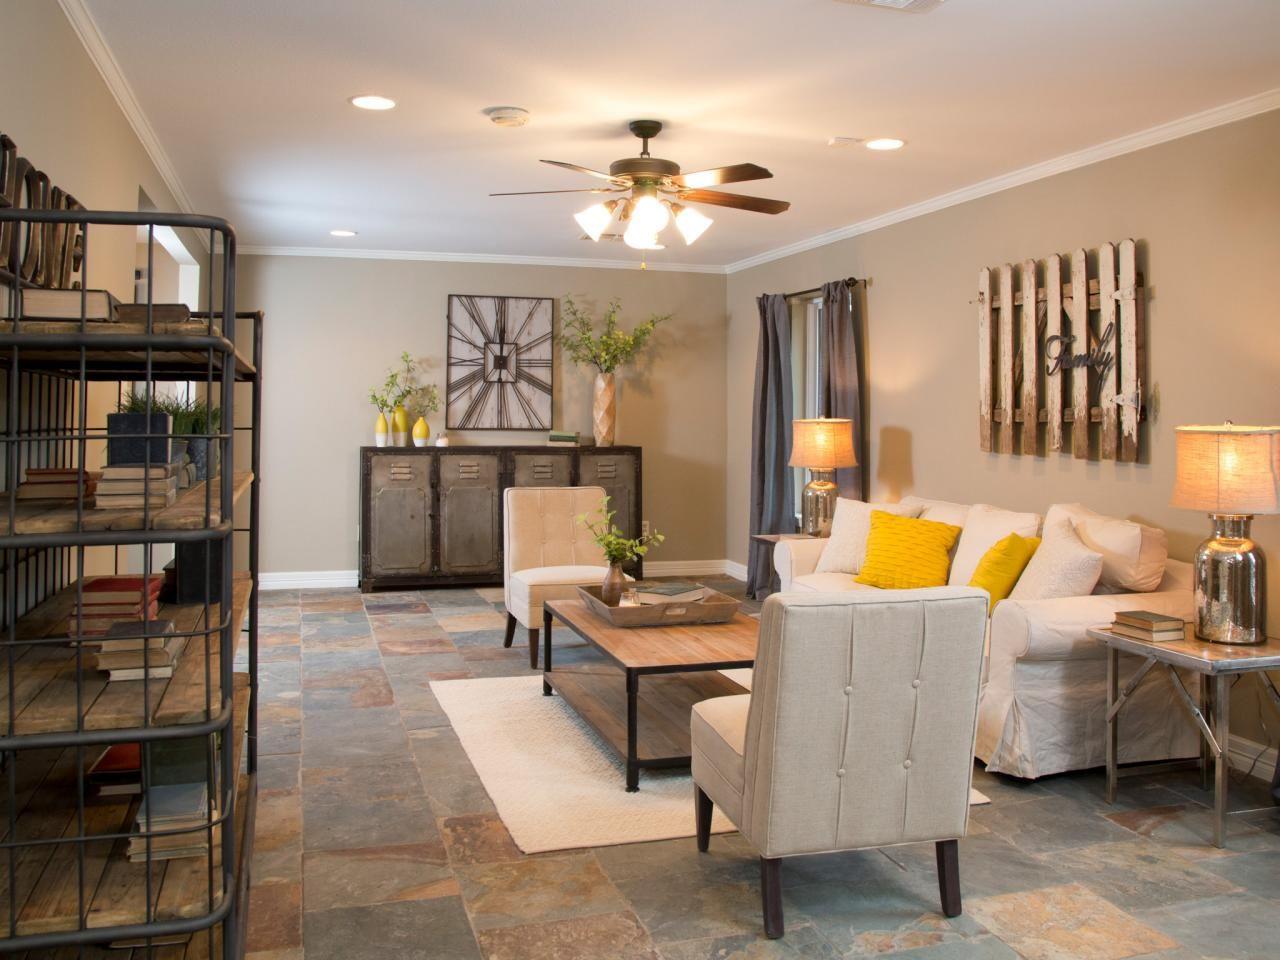 Photos Hgtv S Fixer Upper With Chip And Joanna Gaines Hgtv Best Interior Design Websites Budget Furniture Fixer Upper